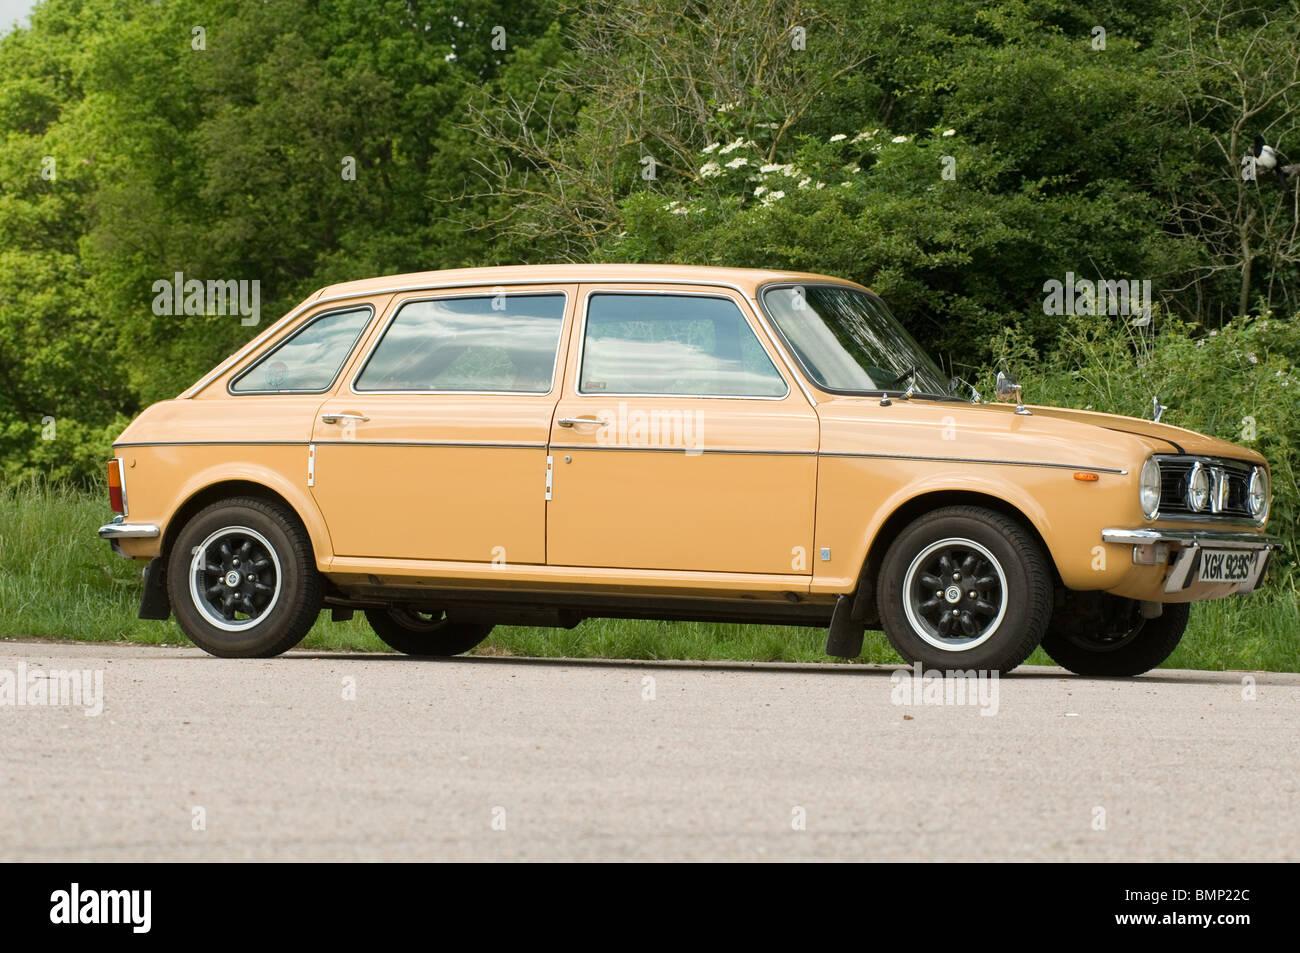 Buy Classic Cars Ireland